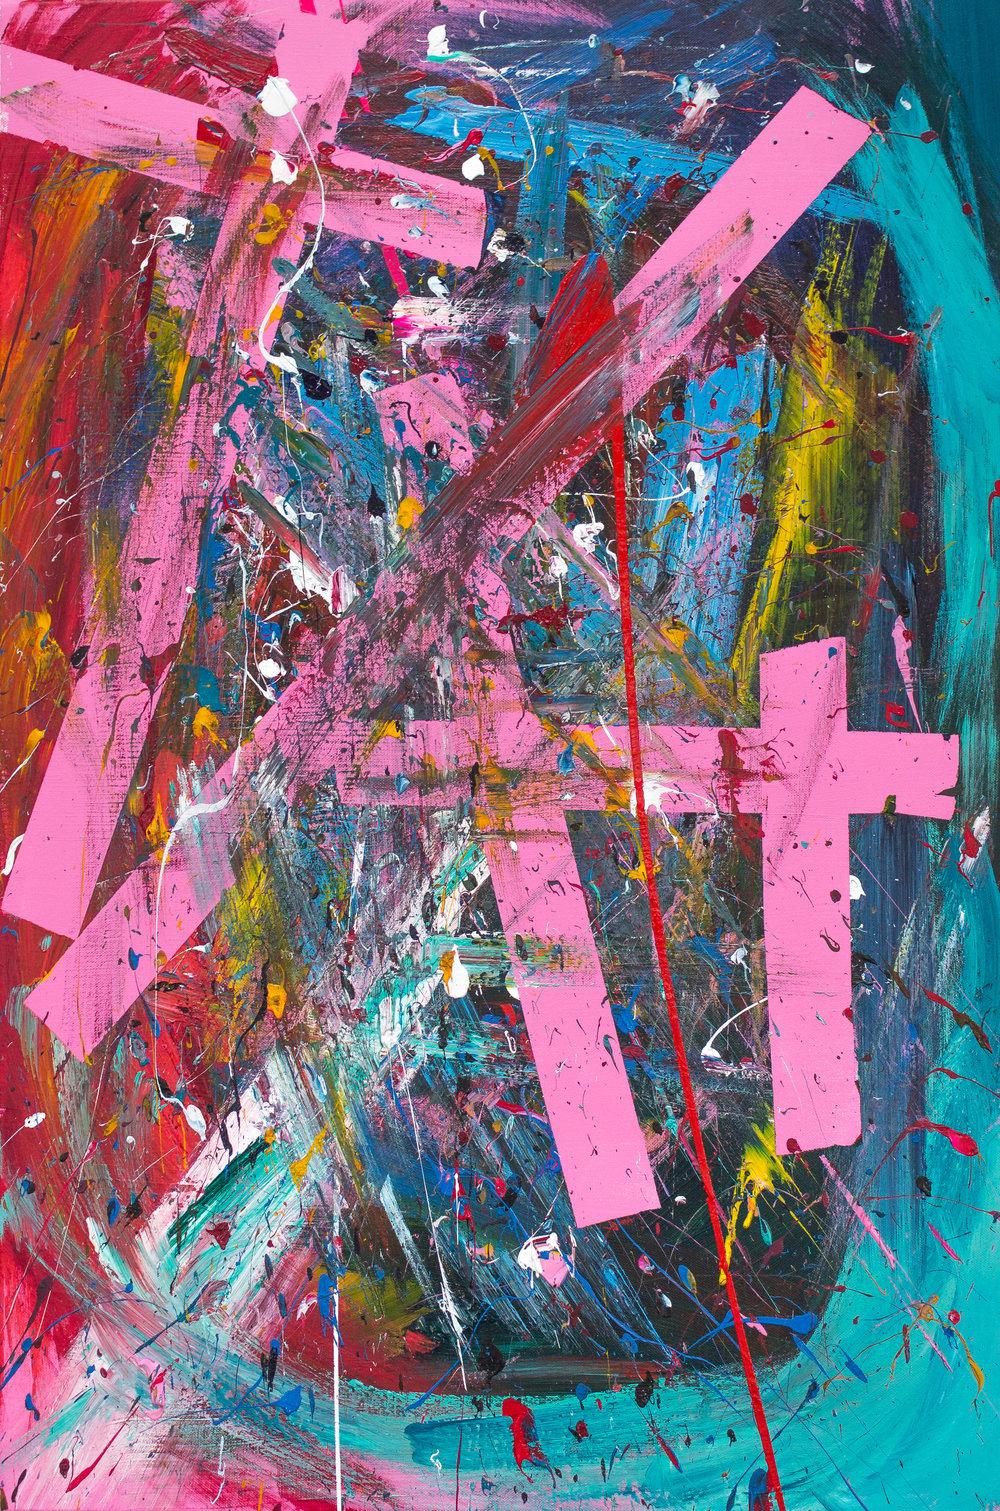 #9 / 60x90 on canvas